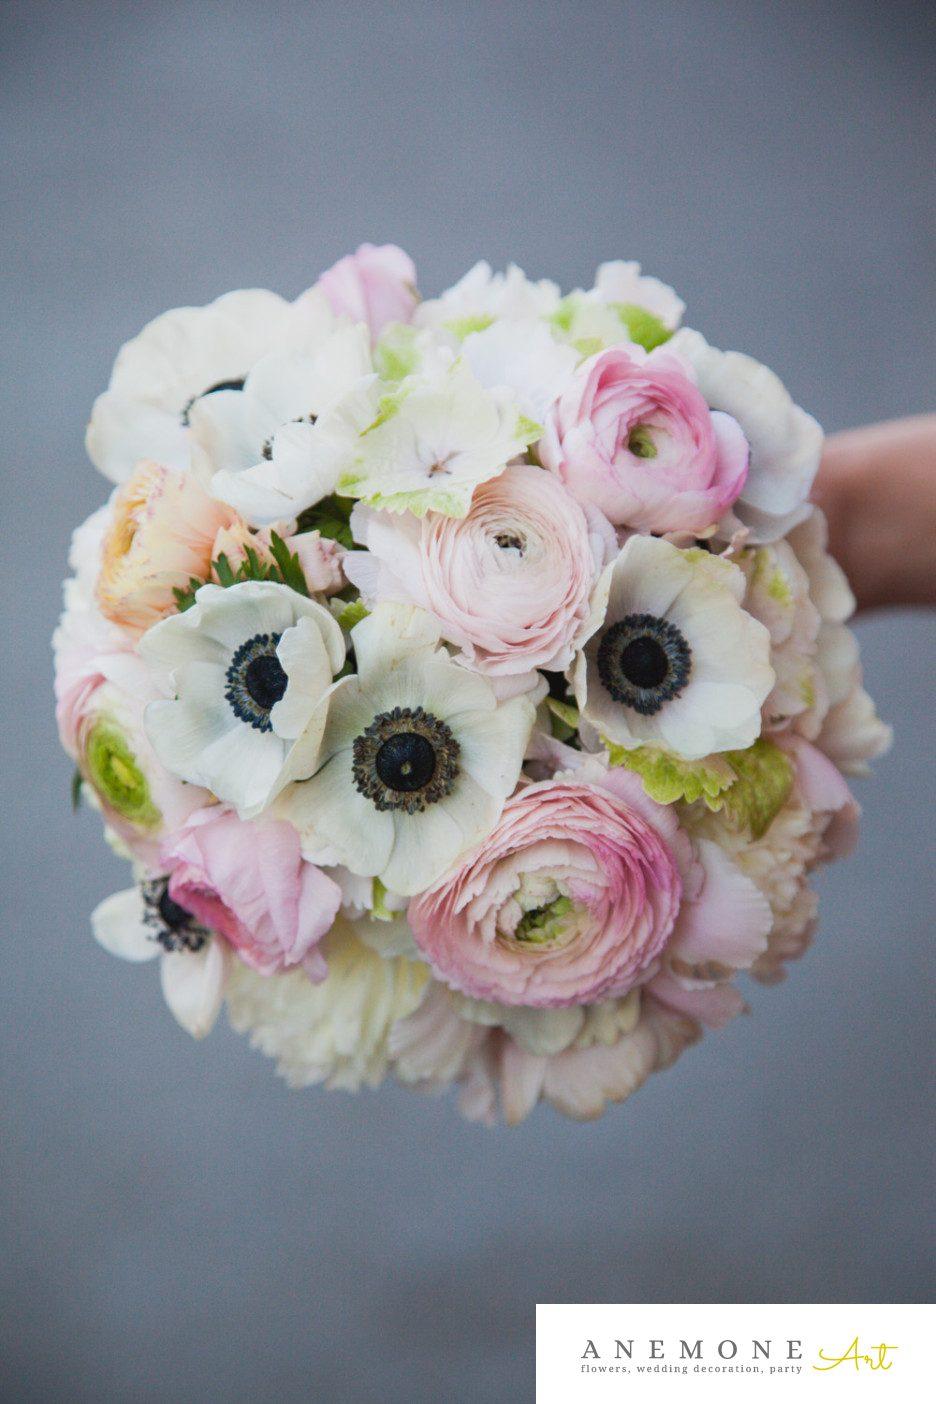 Poza, foto cu Flori de nunta alb, anemone, buchet mireasa, crem, ranunculus, roz in Arad, Timisoara, Oradea (wedding flowers, bouquets) nunta Arad, Timisoara, Oradea